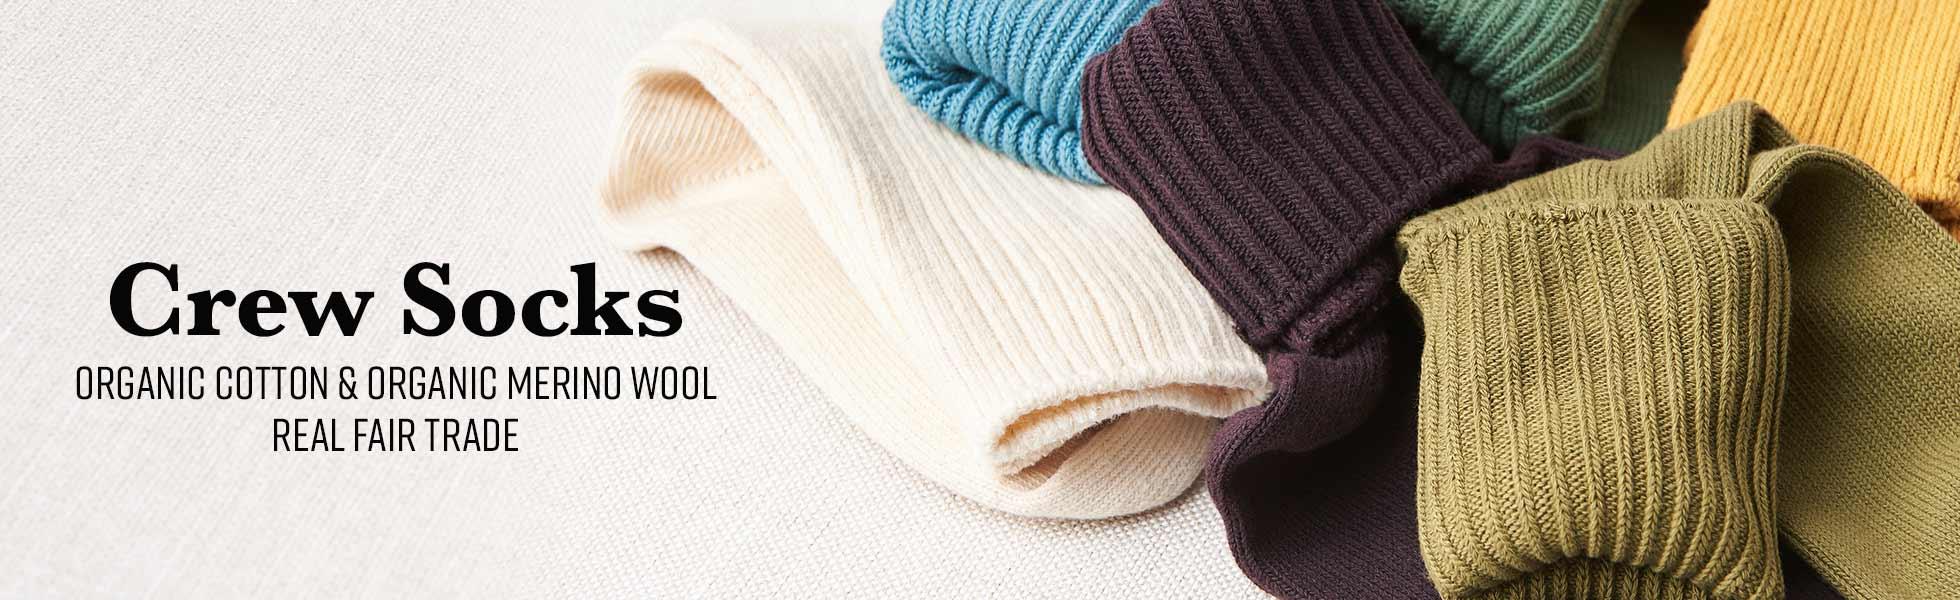 Organic Cotton & Wool Crew Socks